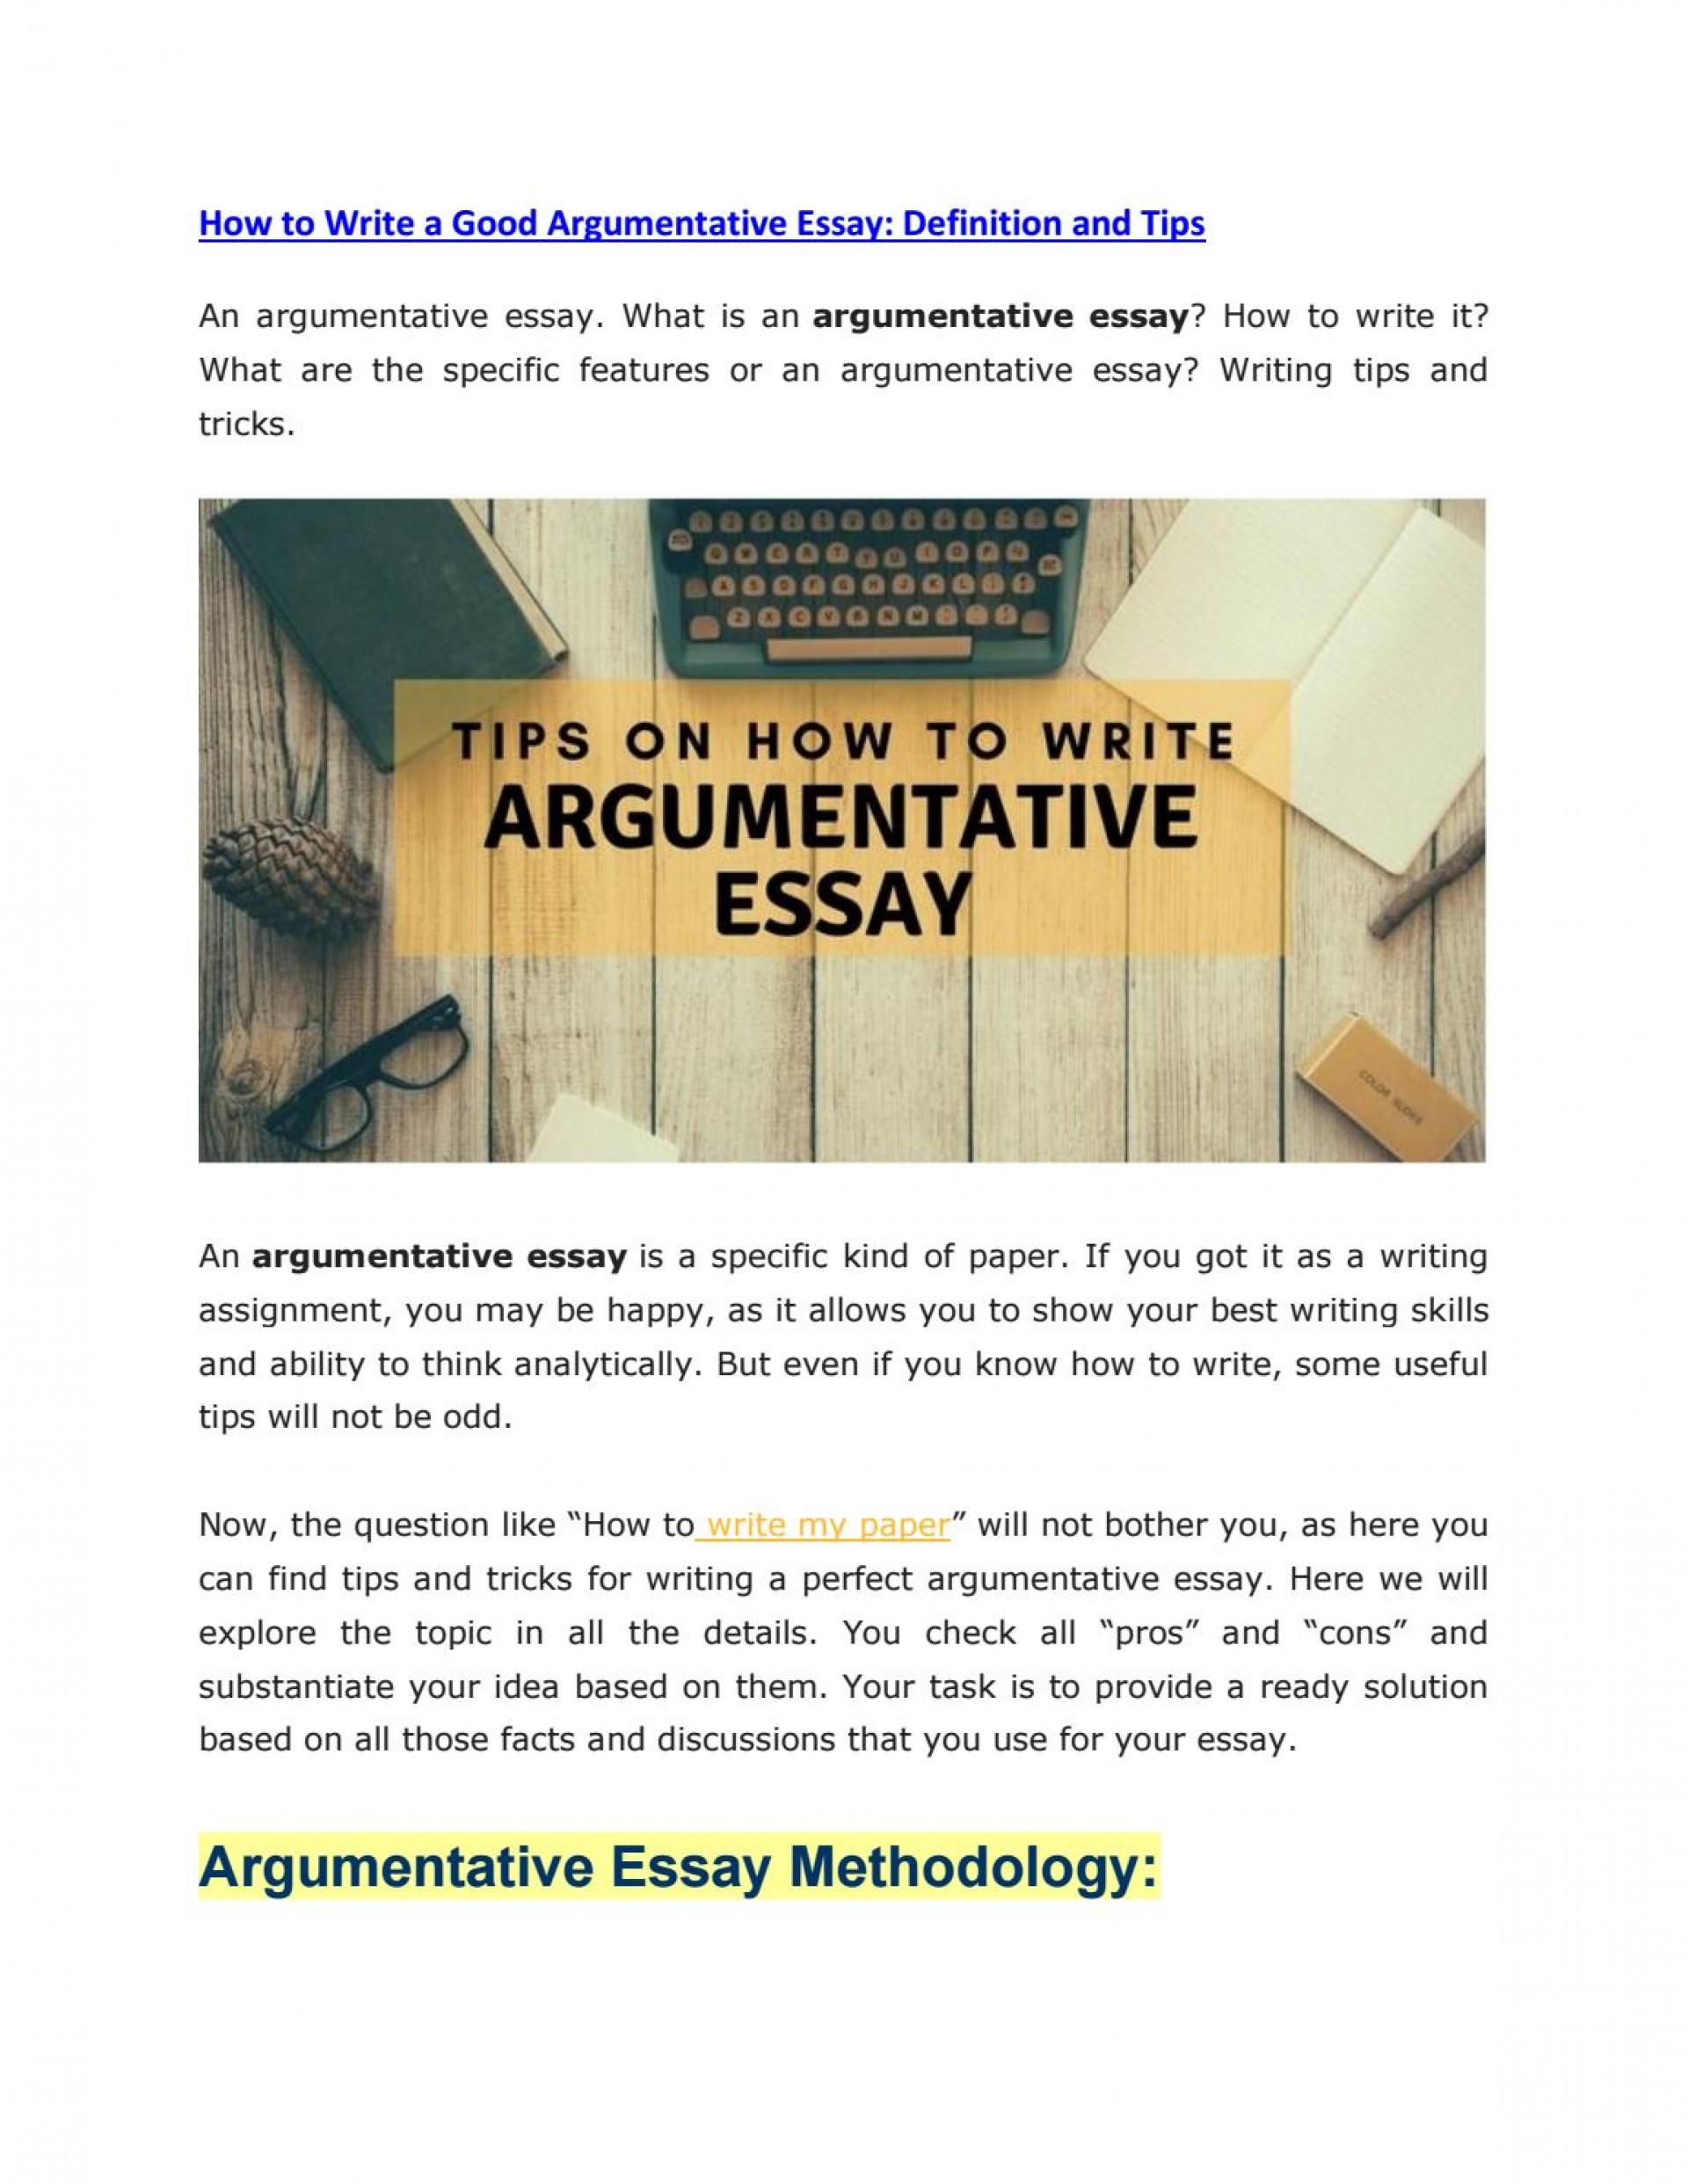 023 Page 1 Argumentative Essay Definition Fearsome Define Persuasive/argumentative Pdf 1920